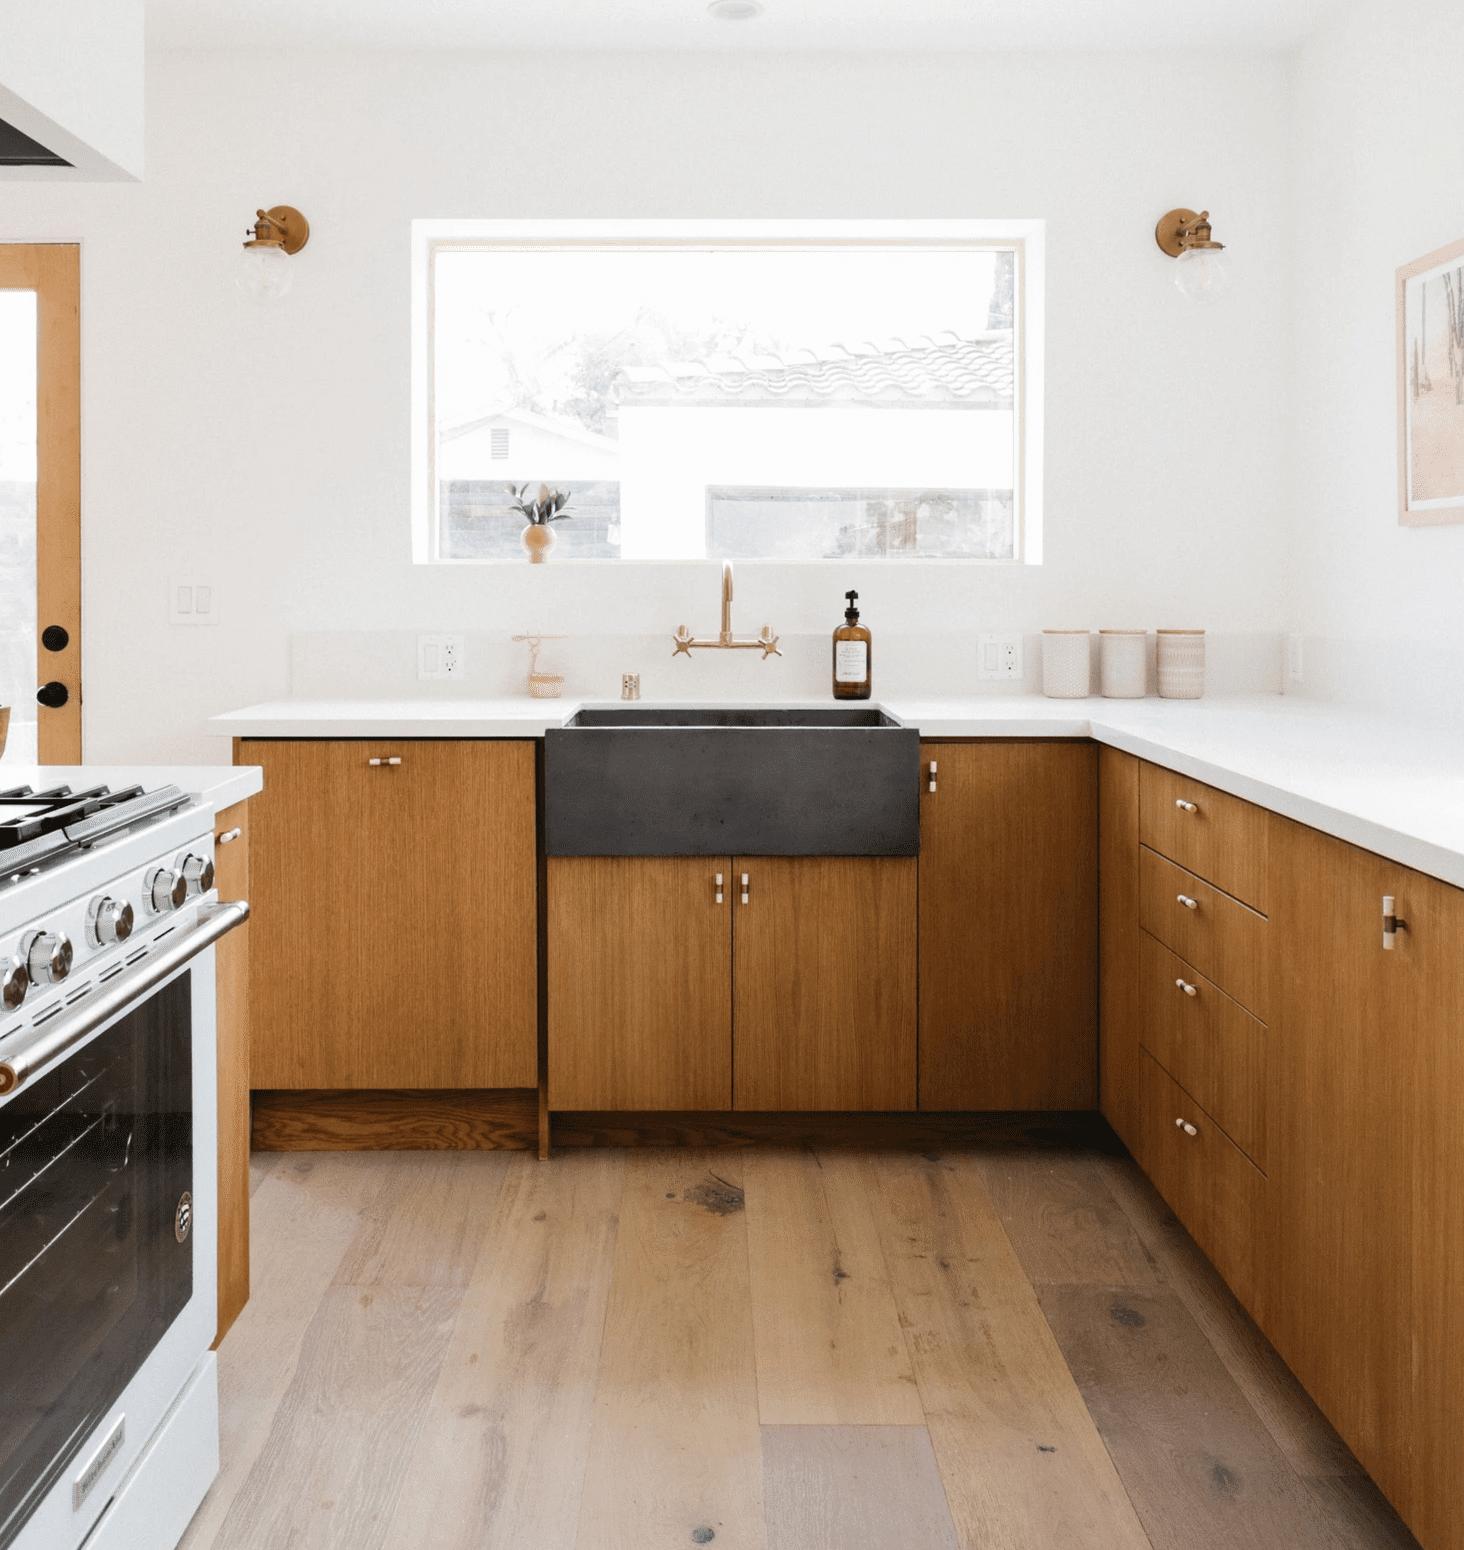 A kitchen with white walls and a matching white backsplash